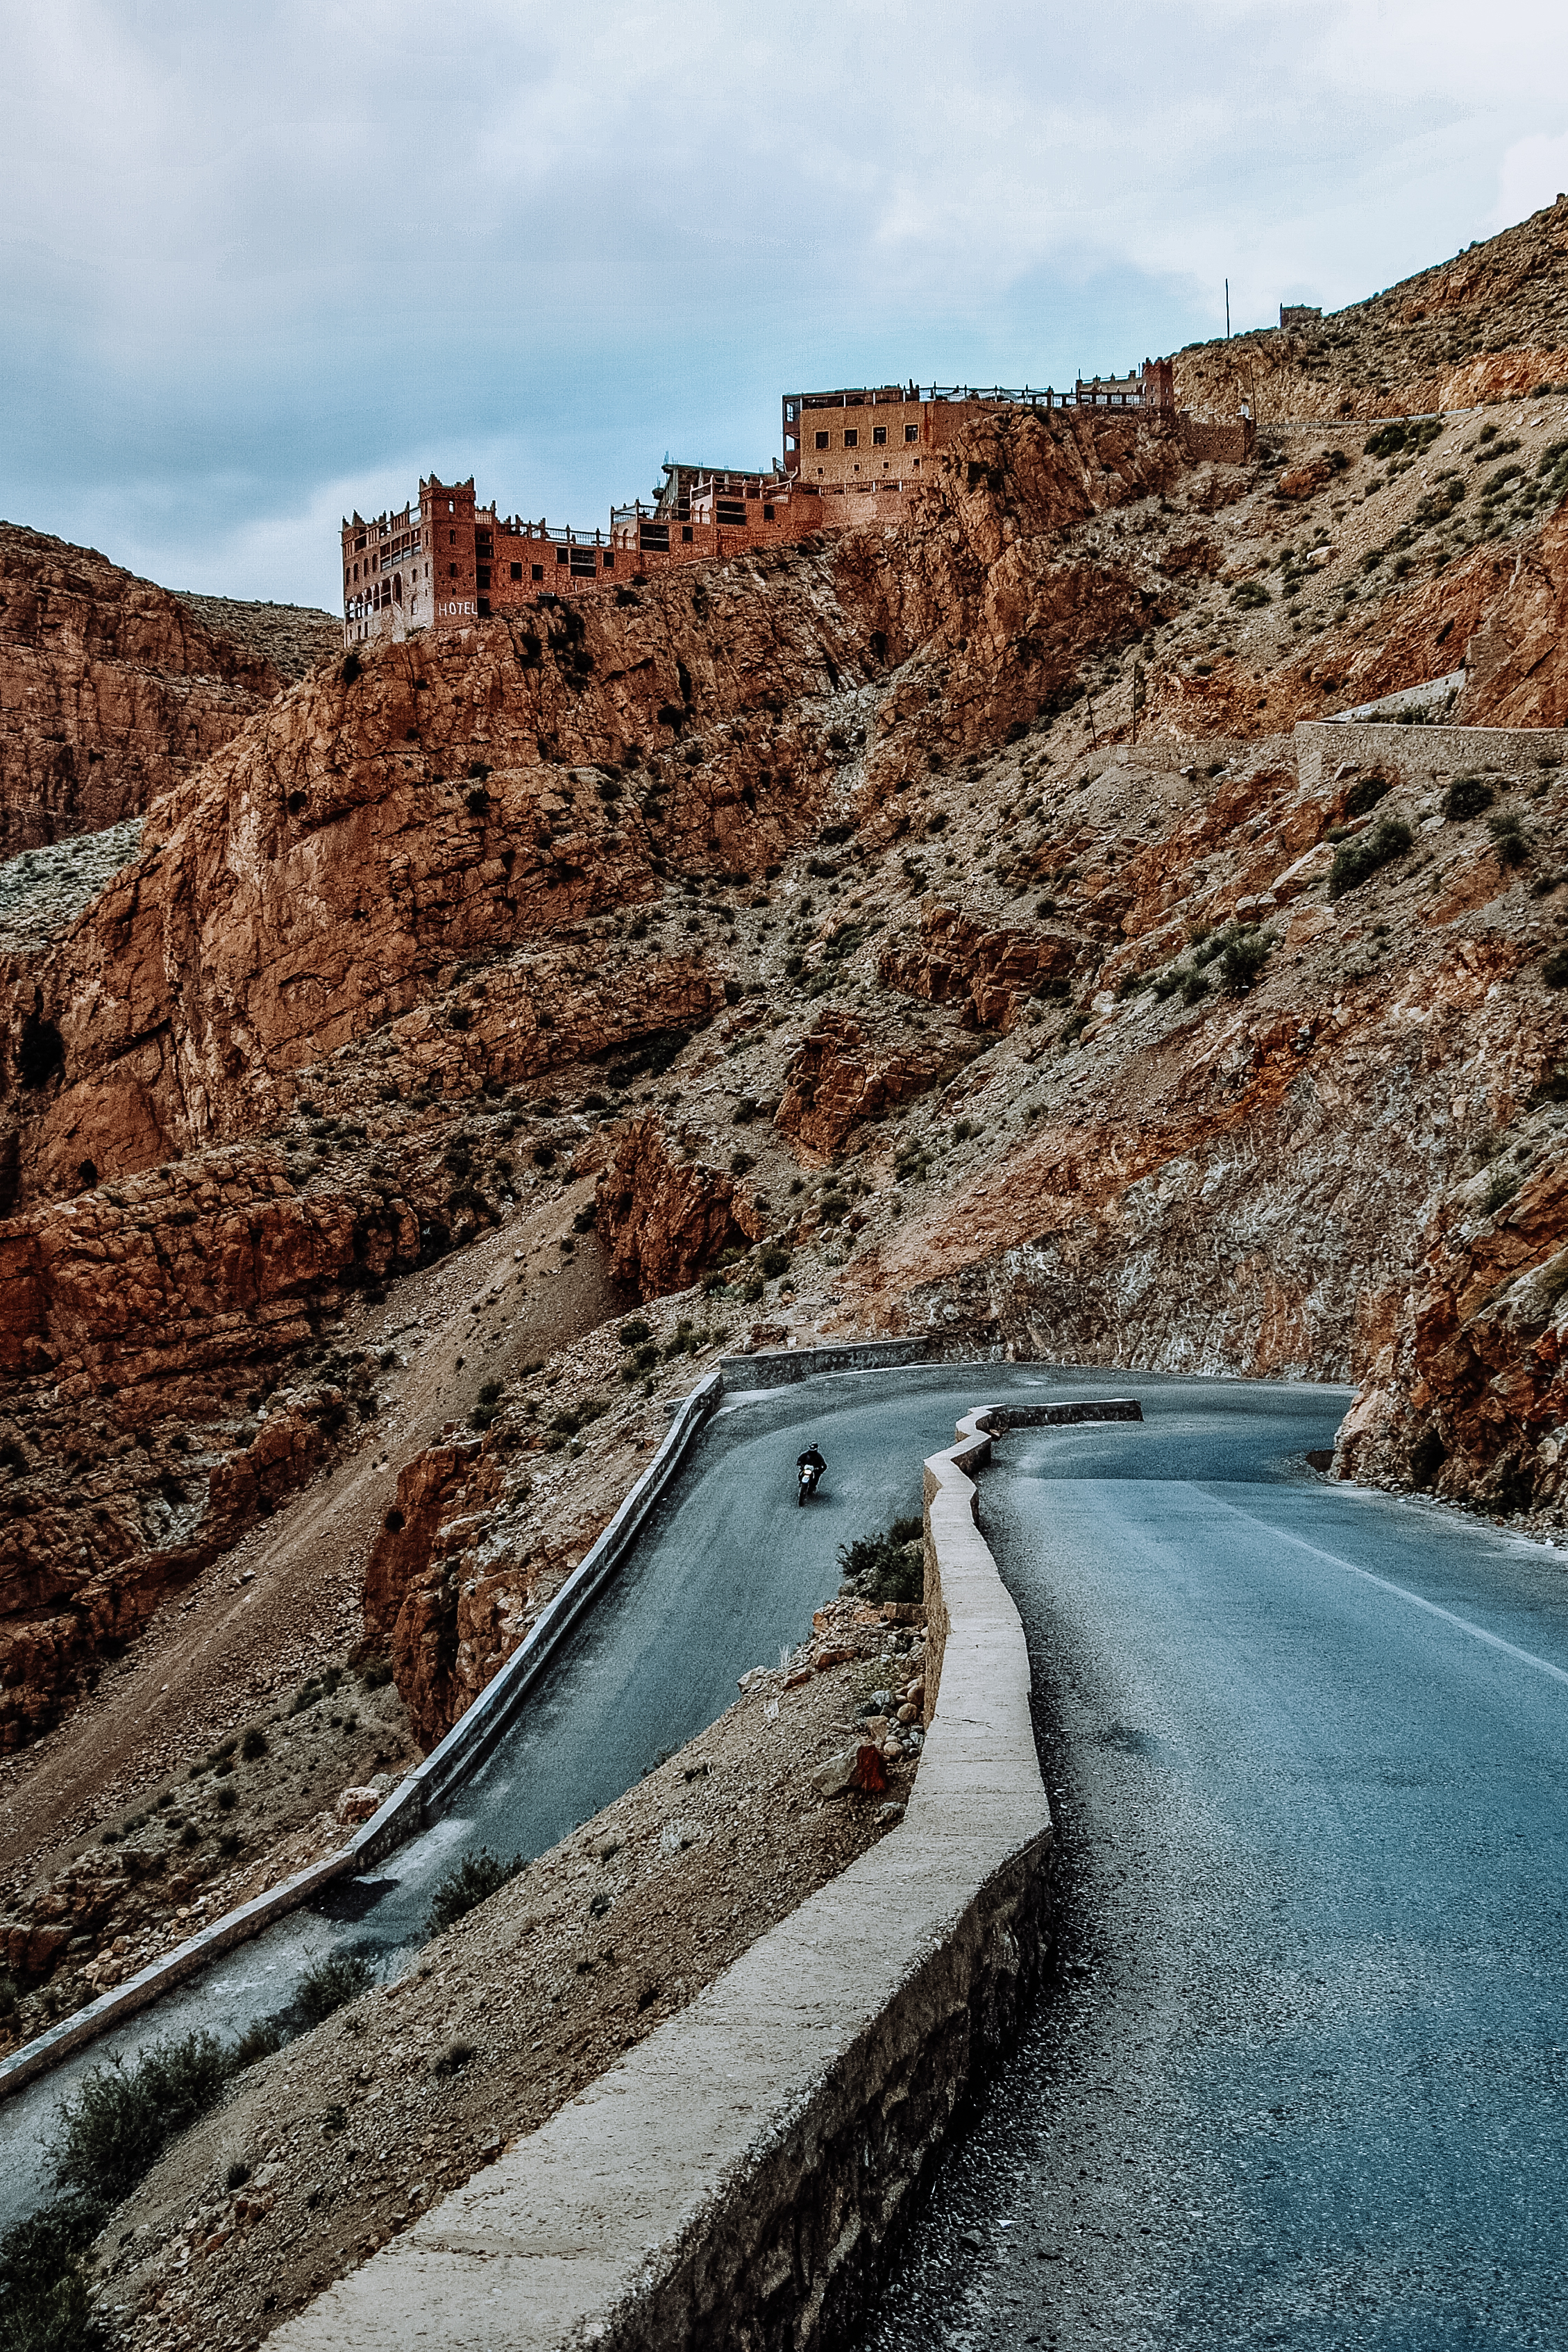 Dades Gorge